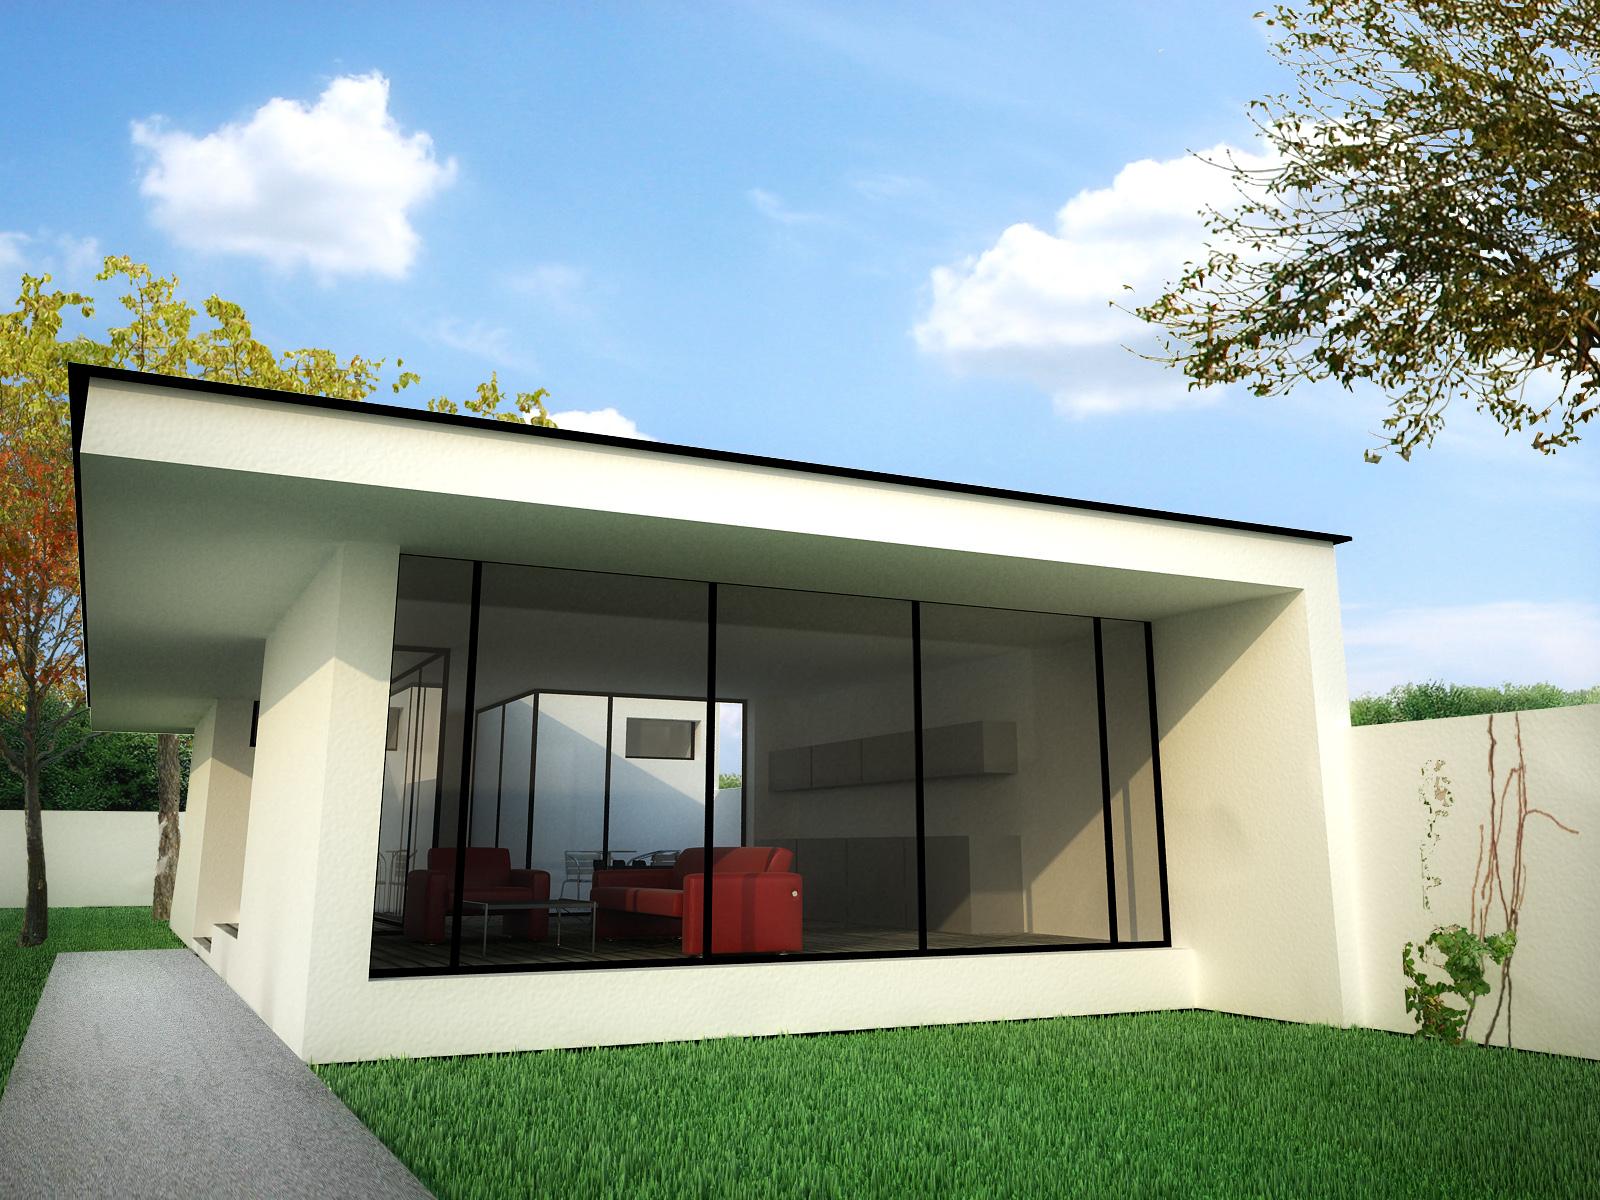 Proiecte de case moderne casa i gr dina for Case moderne